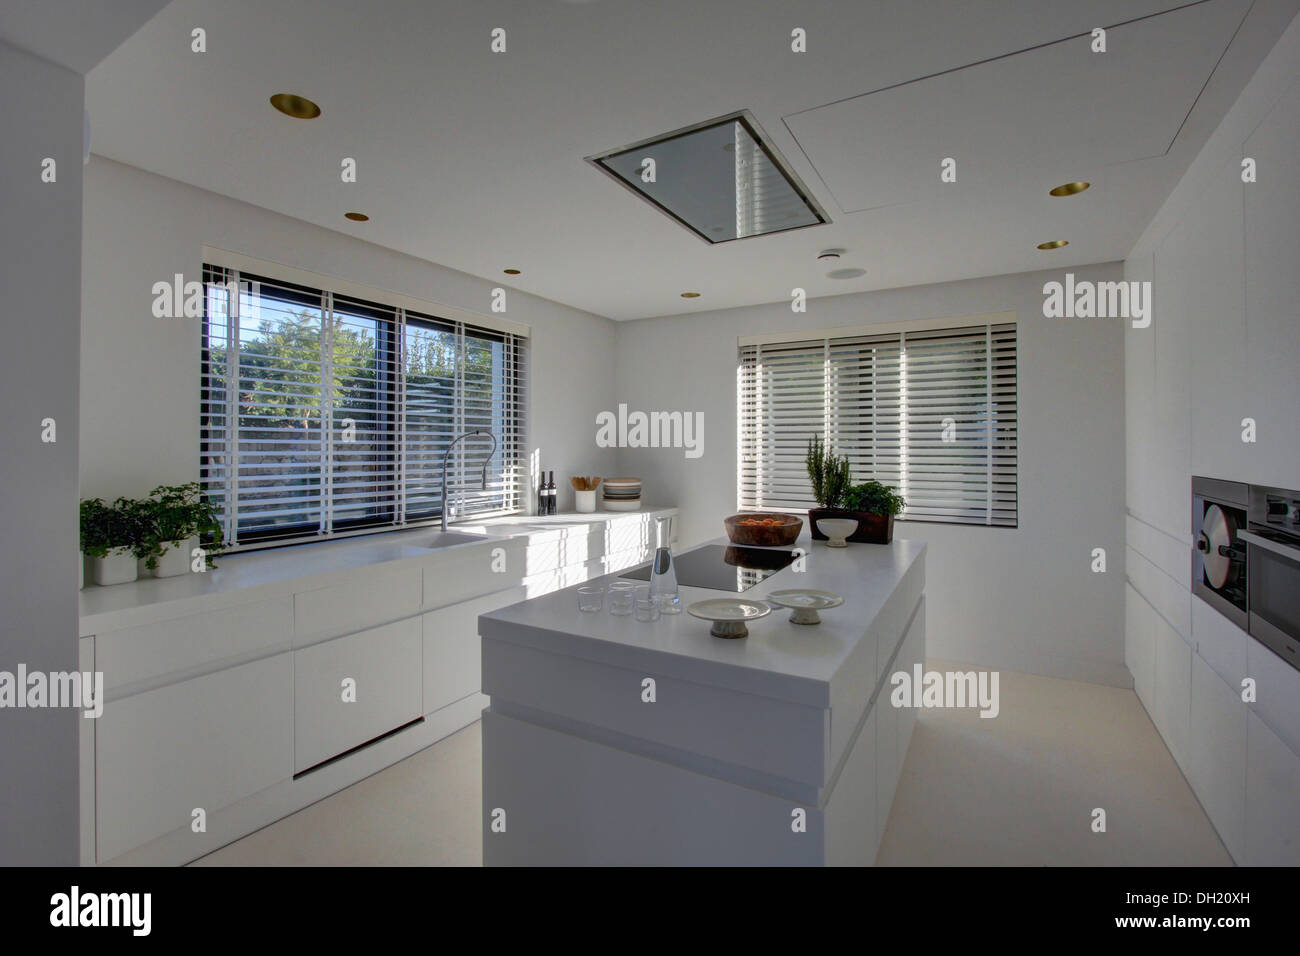 Ideas For Blinds White Kitchen on white cabinets for kitchens, white curtains for kitchens, white furniture for kitchens, white granite for kitchens, white ceramic tile for kitchens, white paint for kitchens,